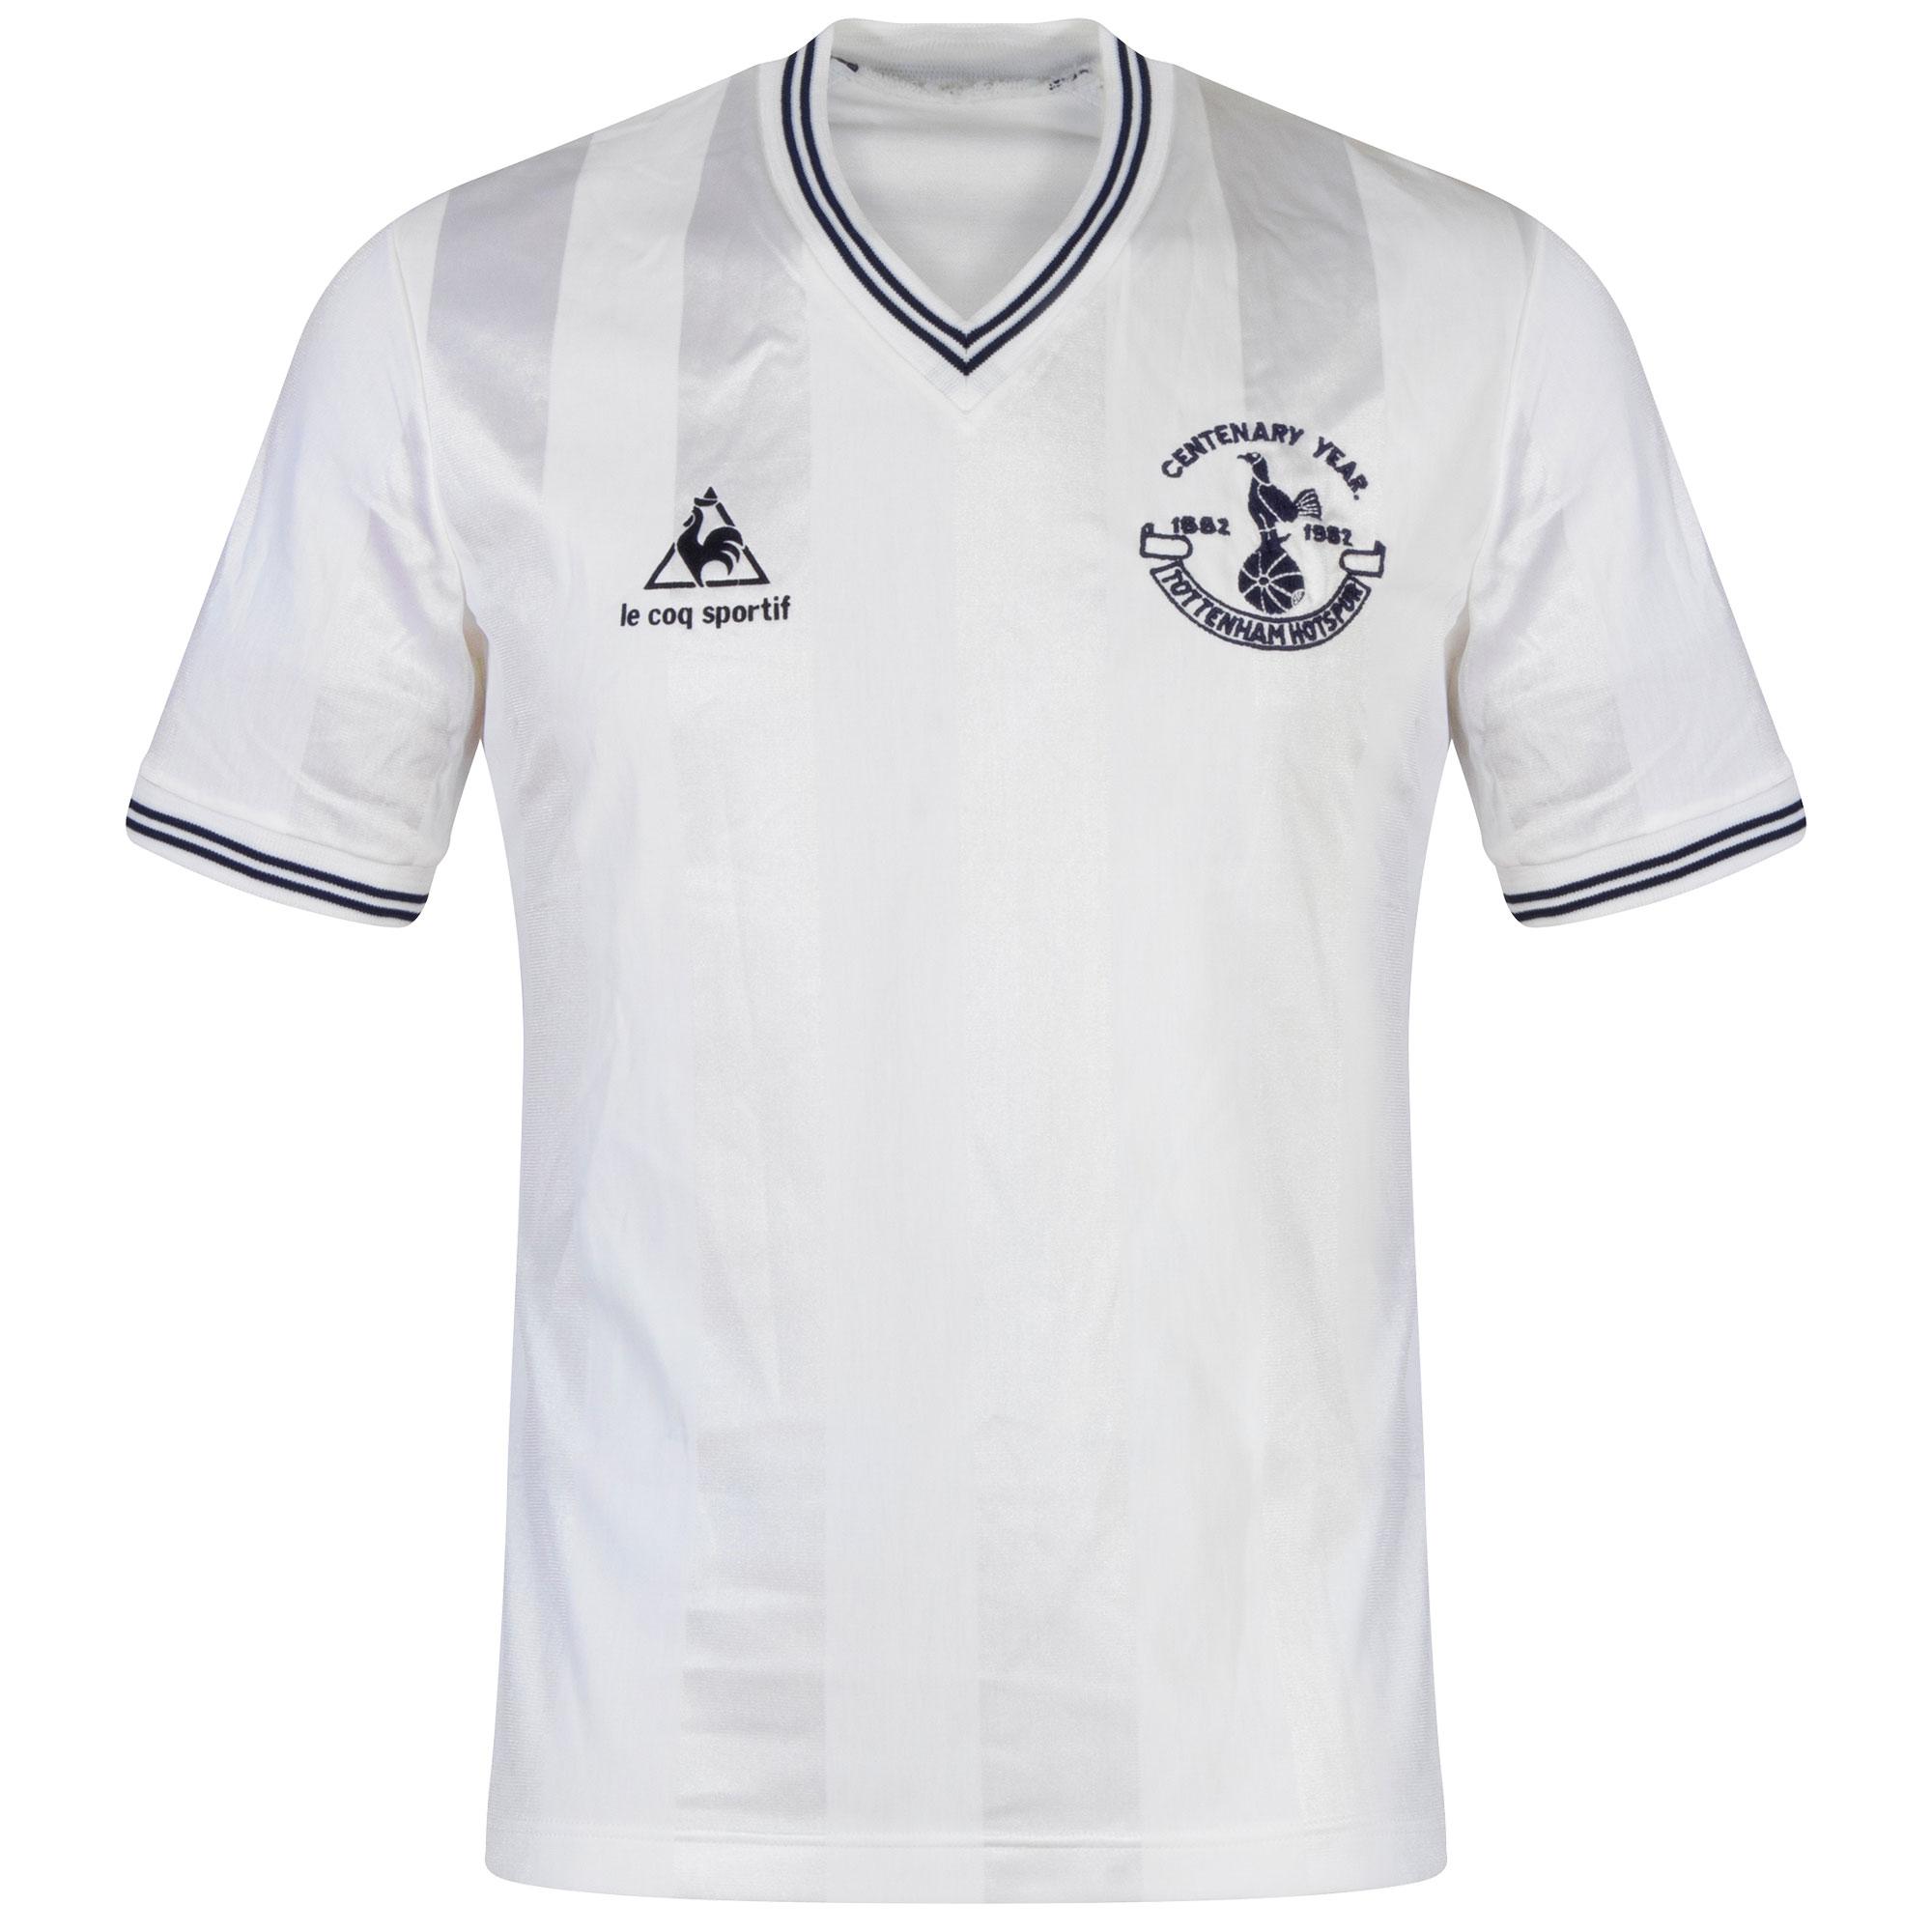 Le Coq Sportif Tottenham Hotspur Home 1982 Centenary Shirt - USED Condition (Excellent)